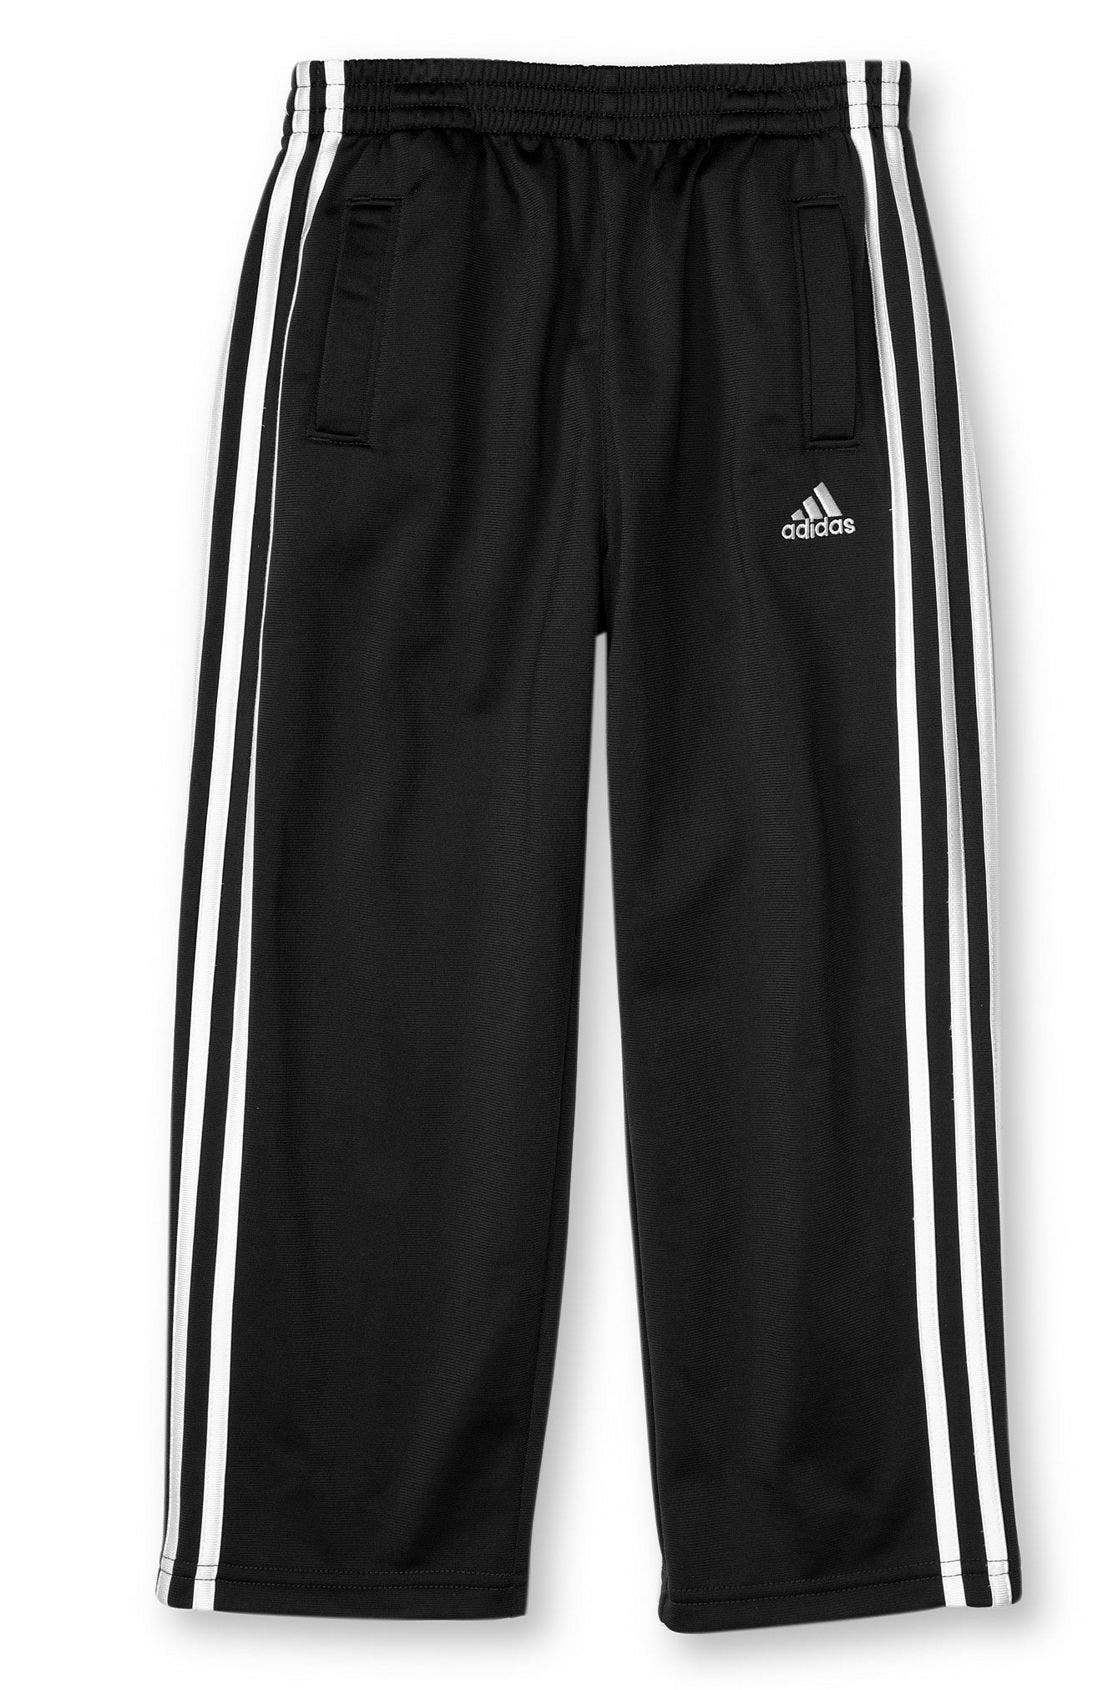 Alternate Image 1 Selected - adidas Elastic Waist Pants (Little Boys)